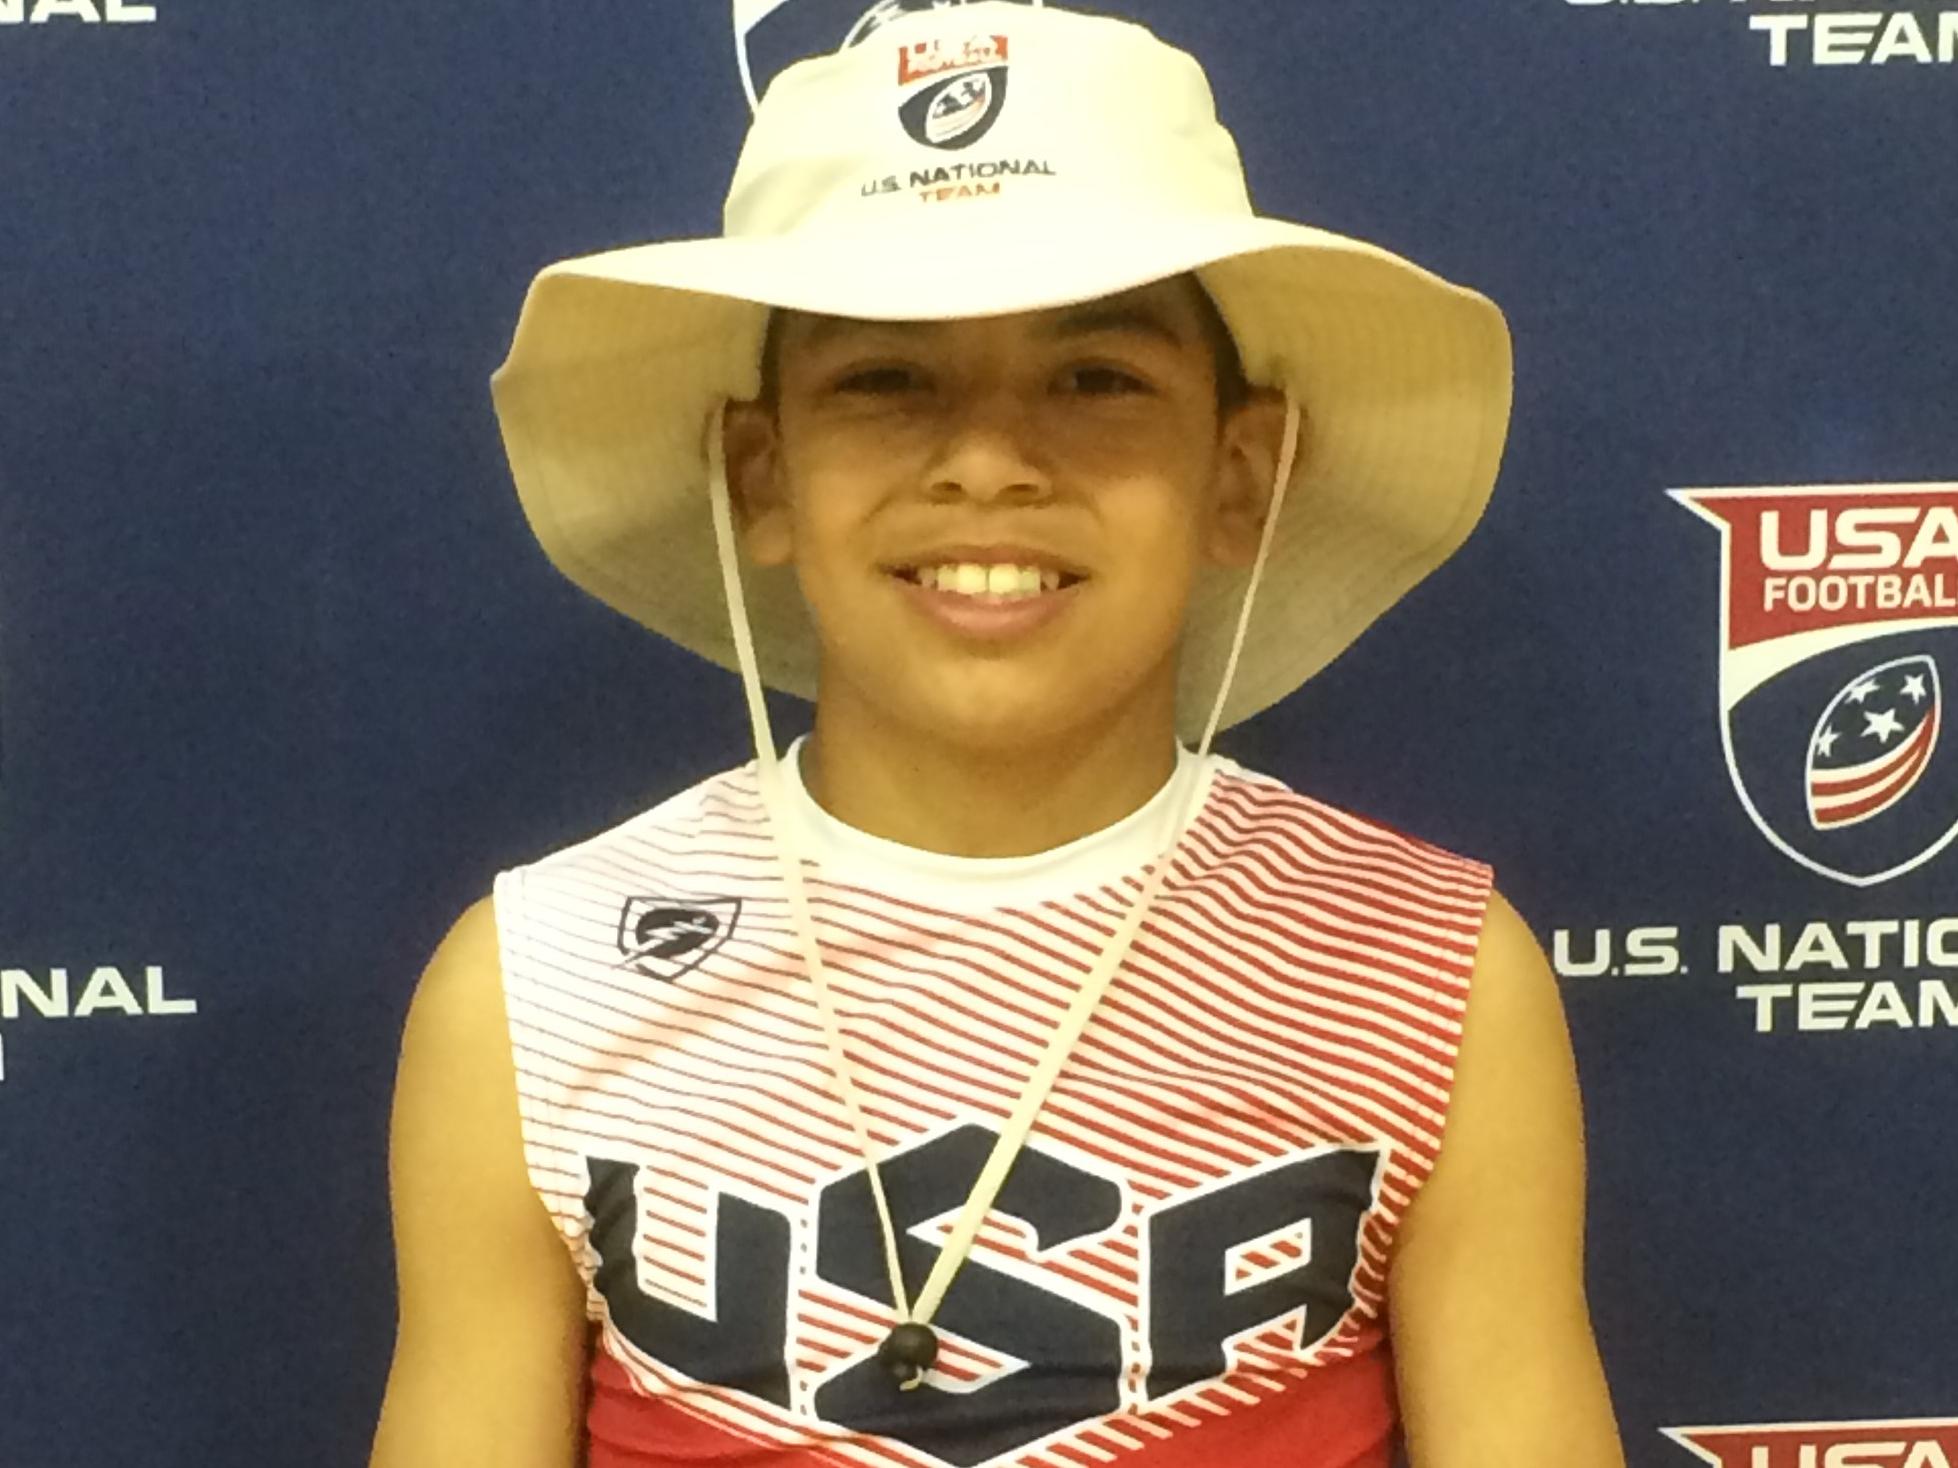 Kyle H. - USA National Team 2018